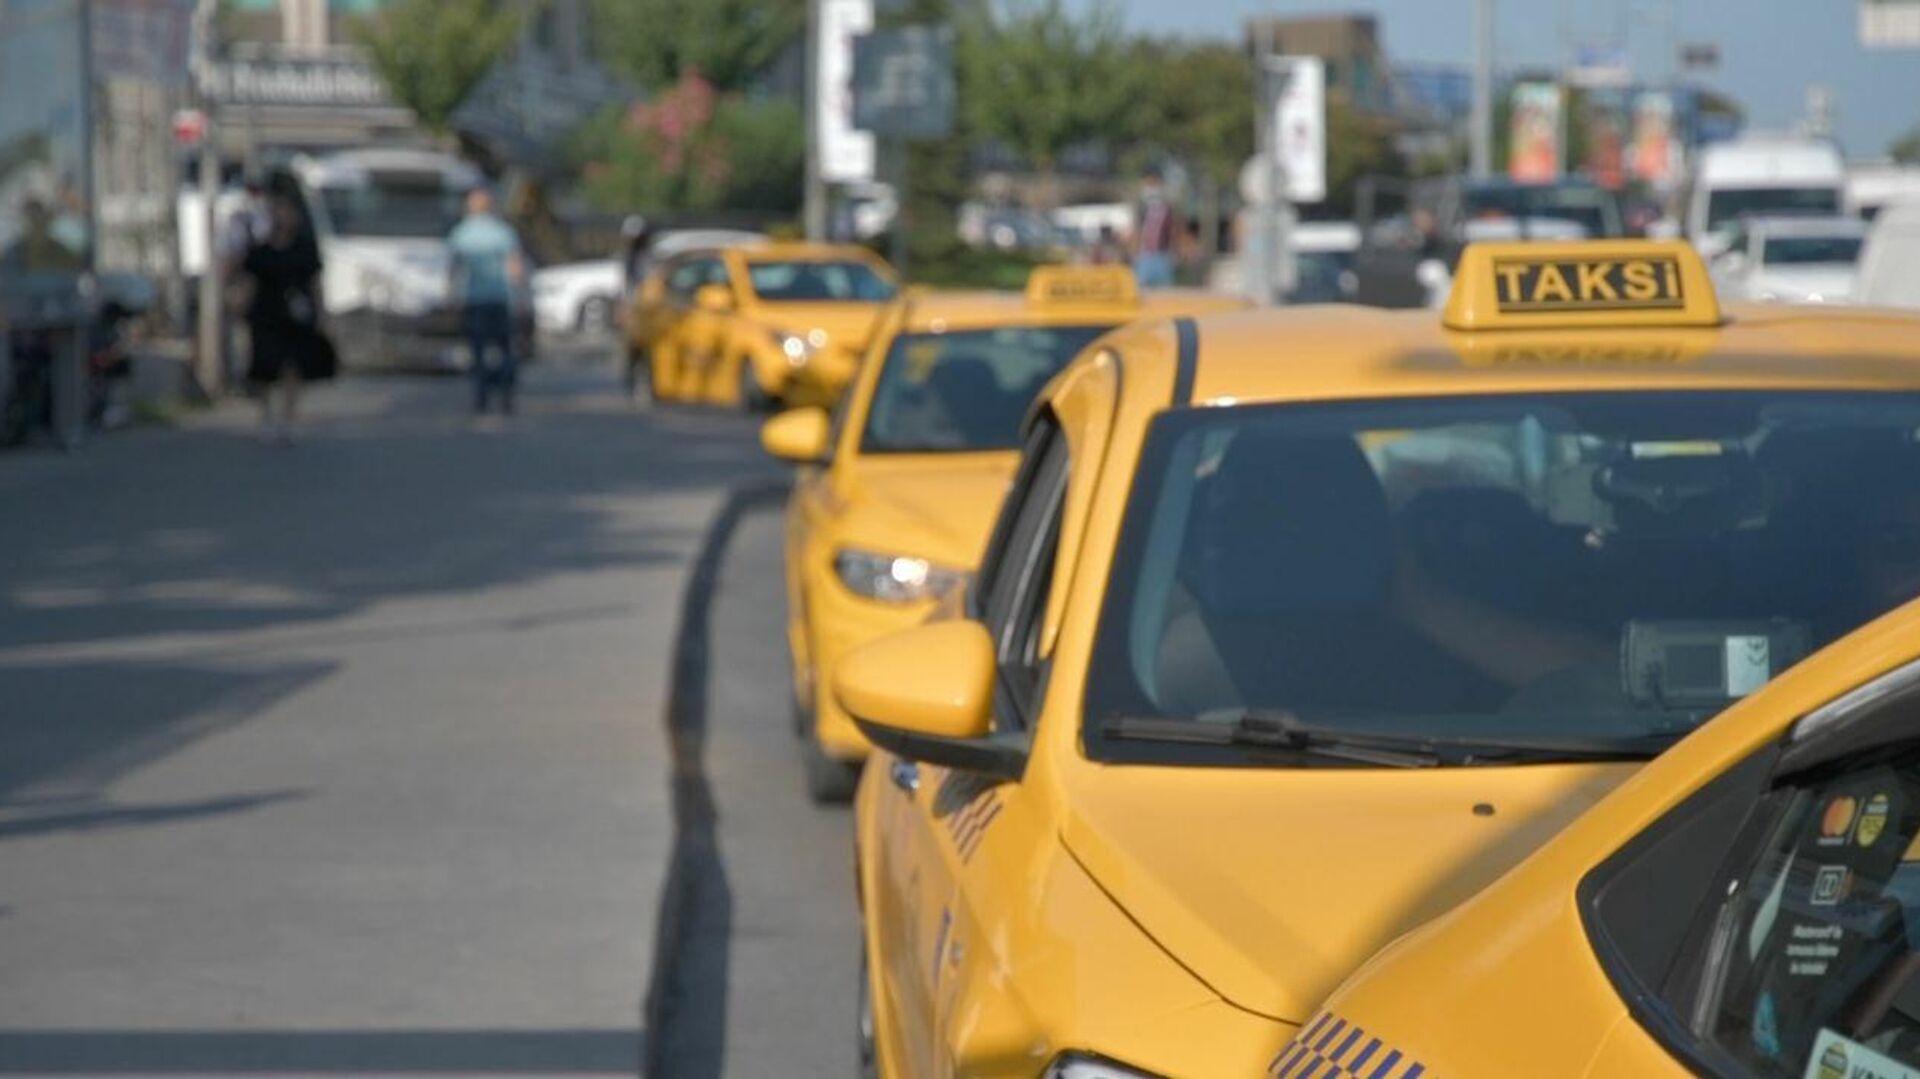 Taksi, taksici - Sputnik Türkiye, 1920, 28.09.2021